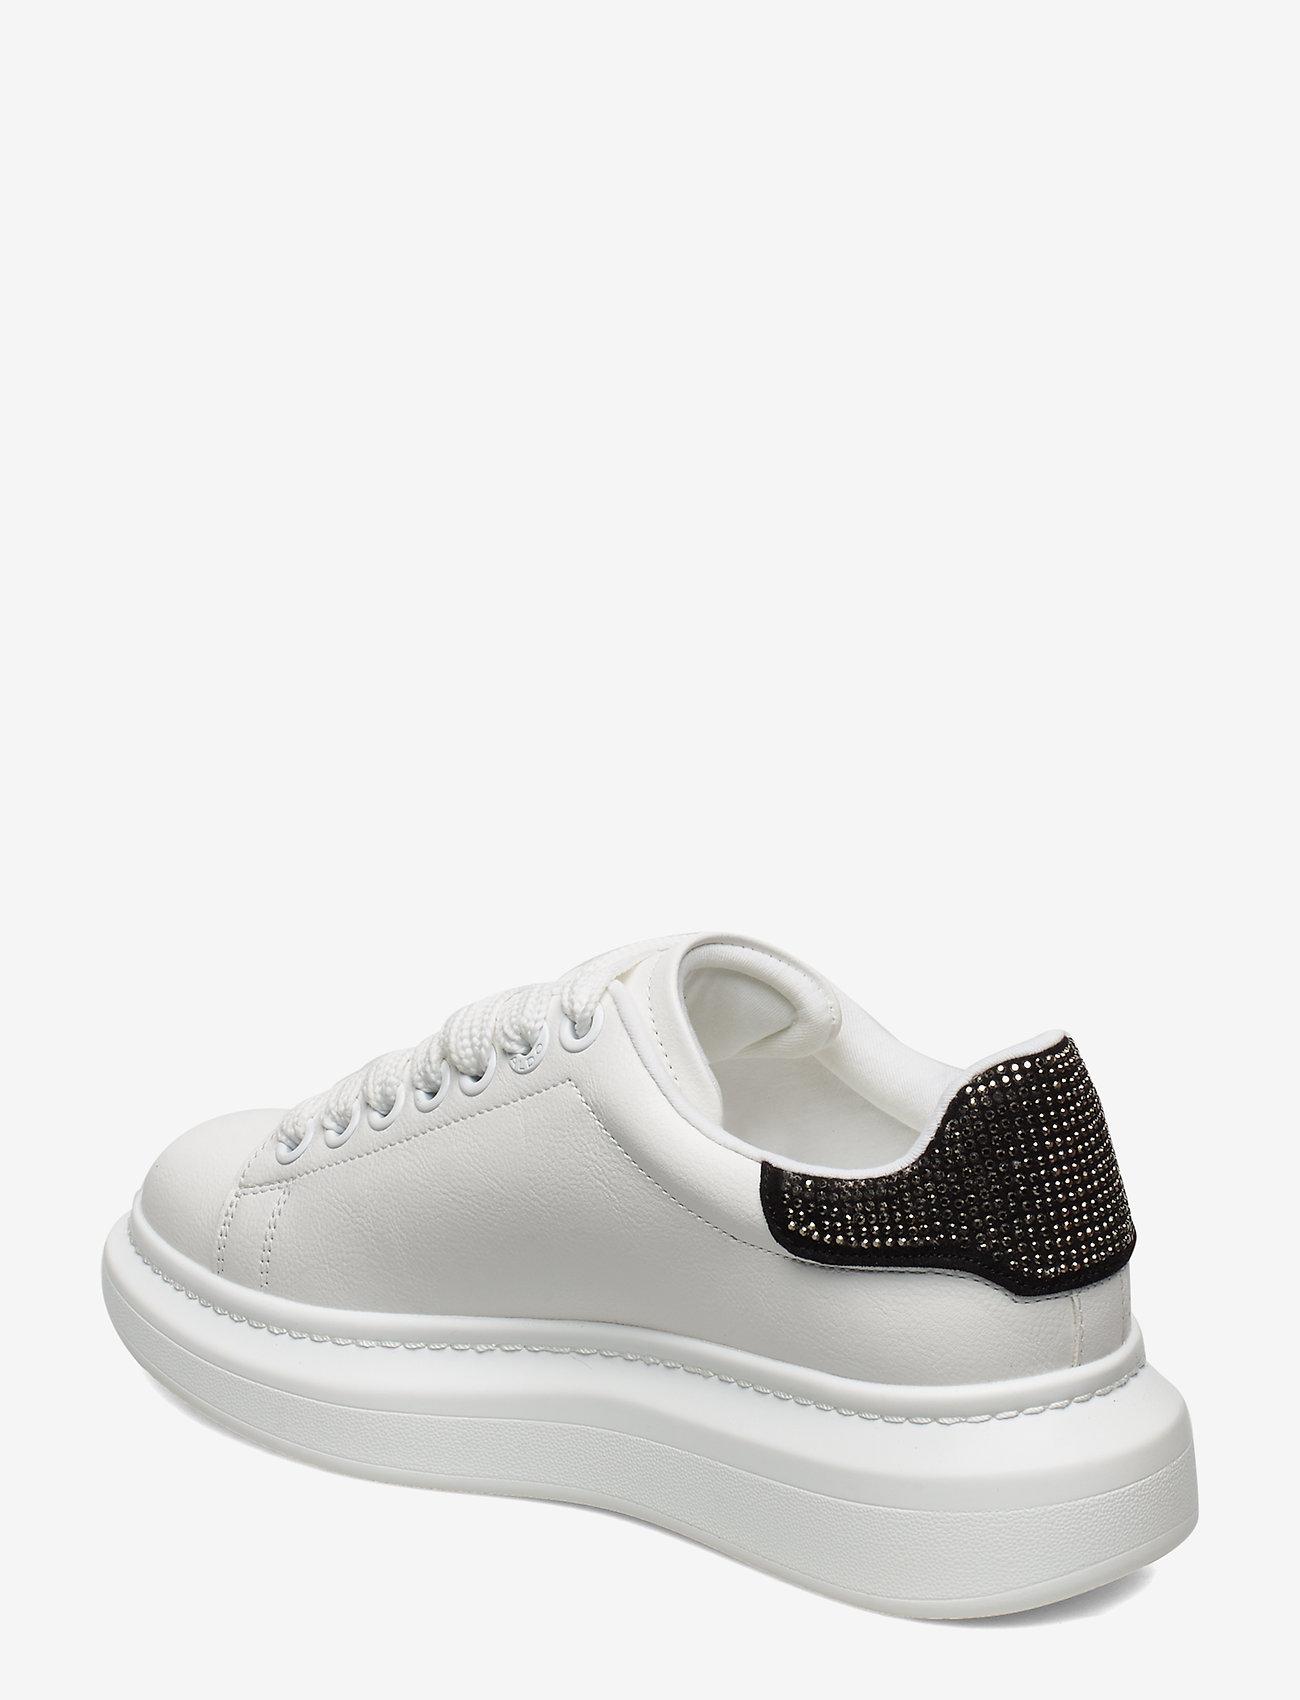 Dazzle (White/black) (363.35 kr) - Aldo